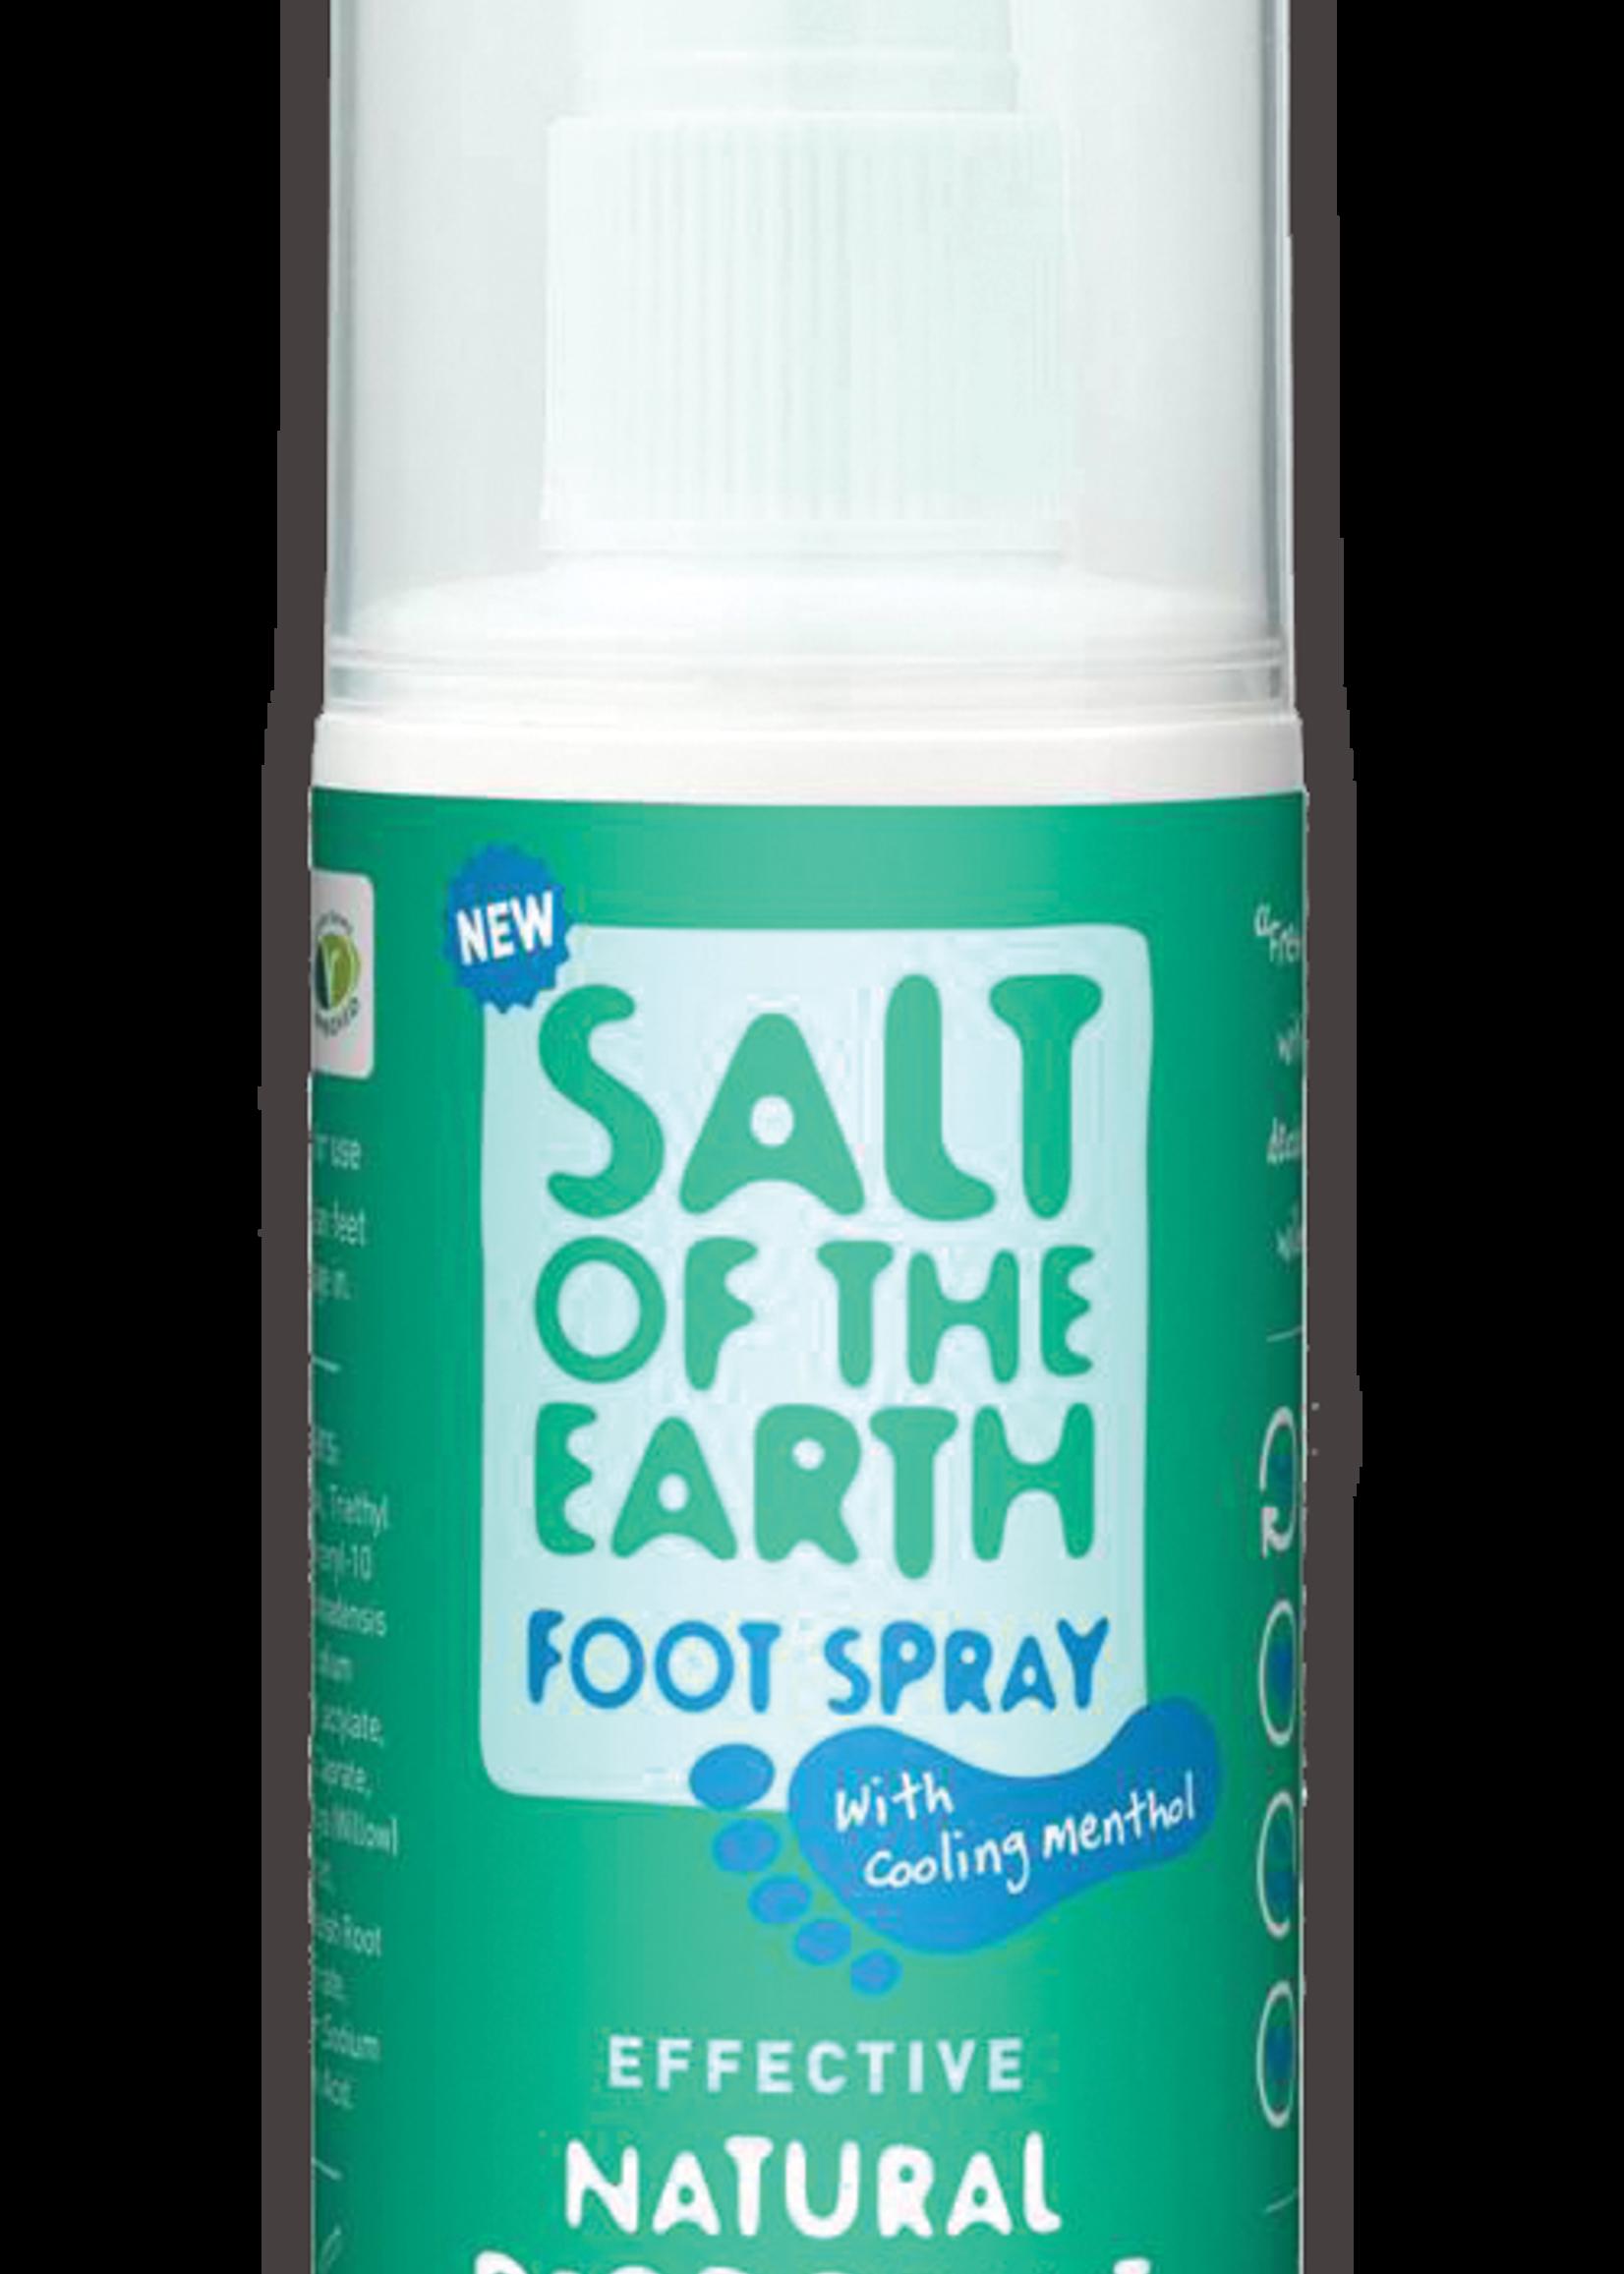 Deodorant spray - Foot spray